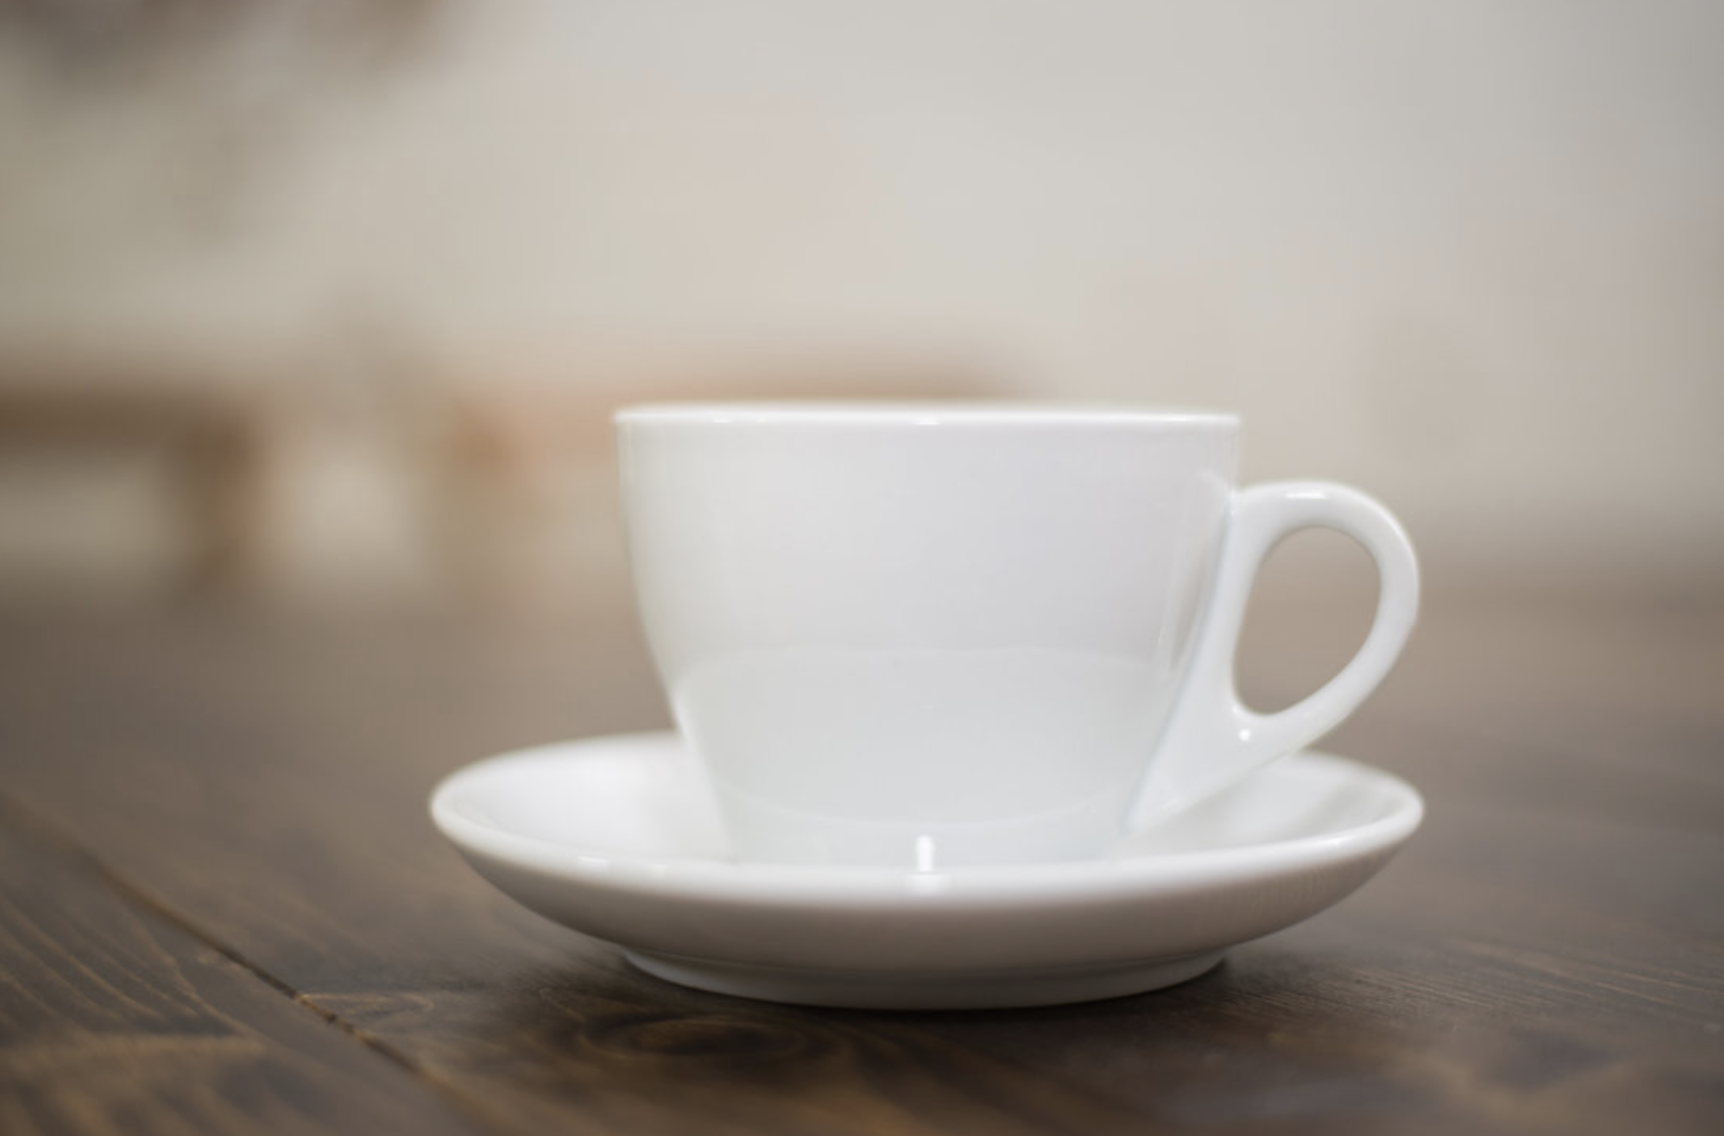 Coffee Cups (Saucer Optional) 7